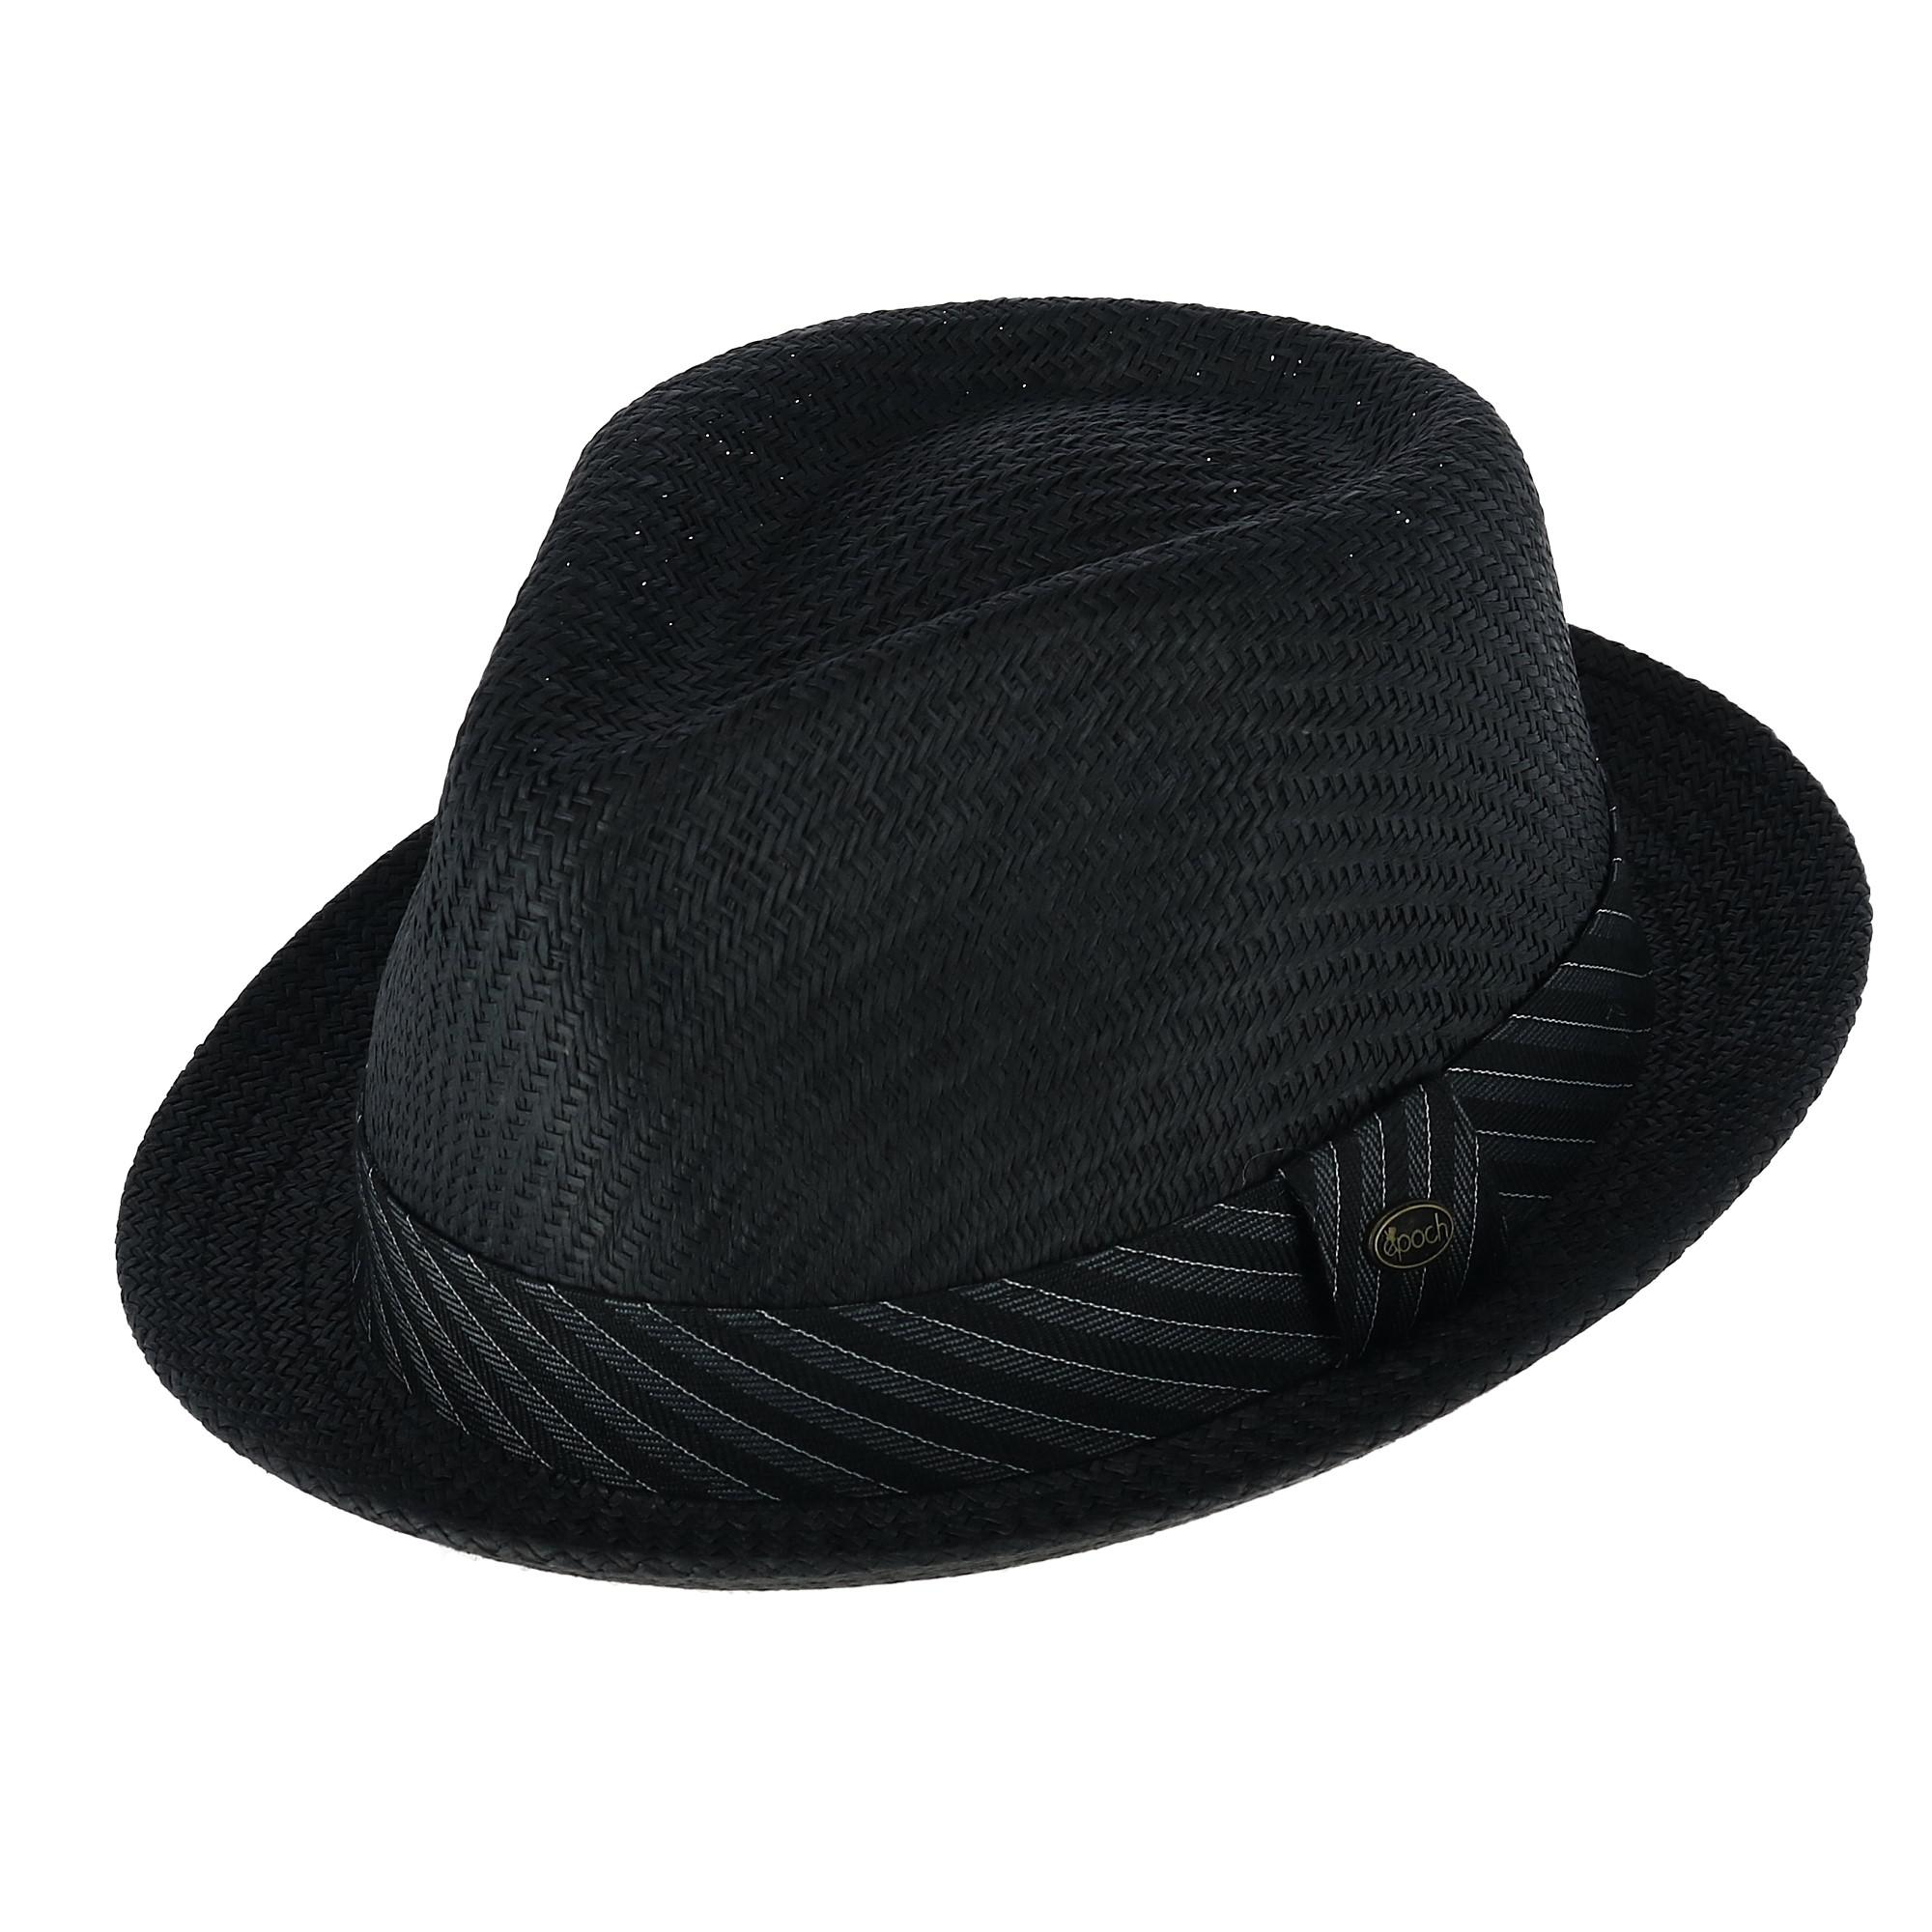 New Epoch Hats Company Men/'s Small Brim Fedora with Striped Fabric Brand